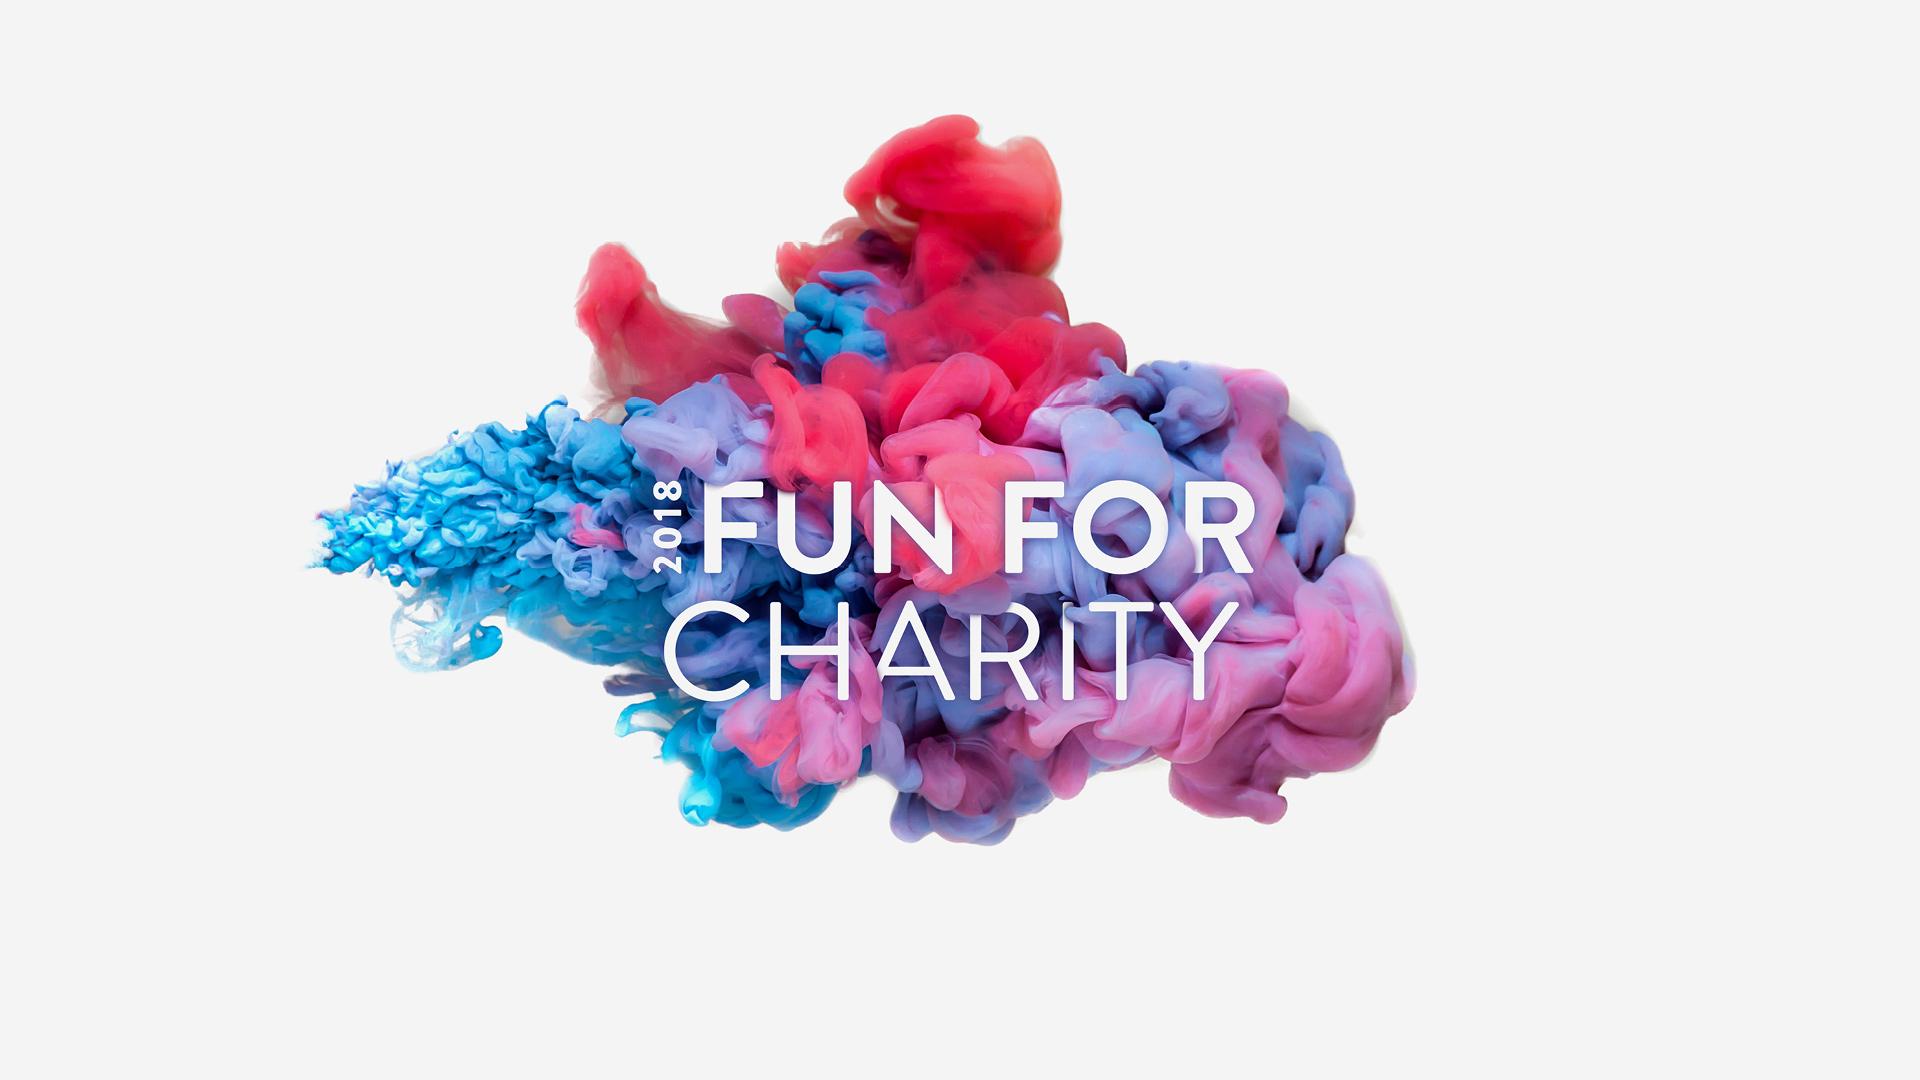 Fun for charity